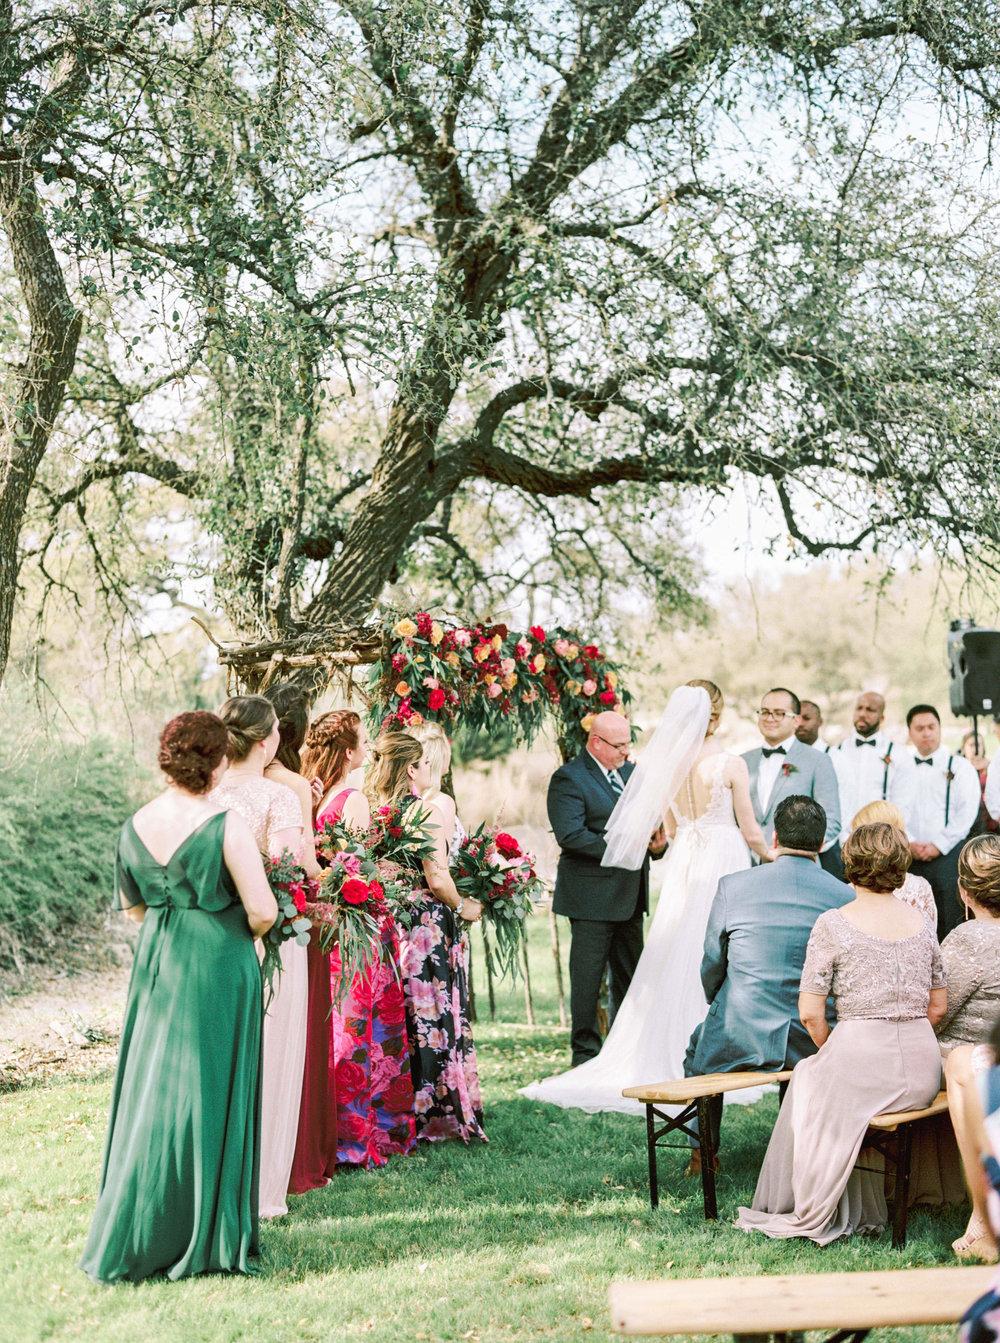 The-Creek-Haus-Wedding-Dripping-Springs-93.jpg